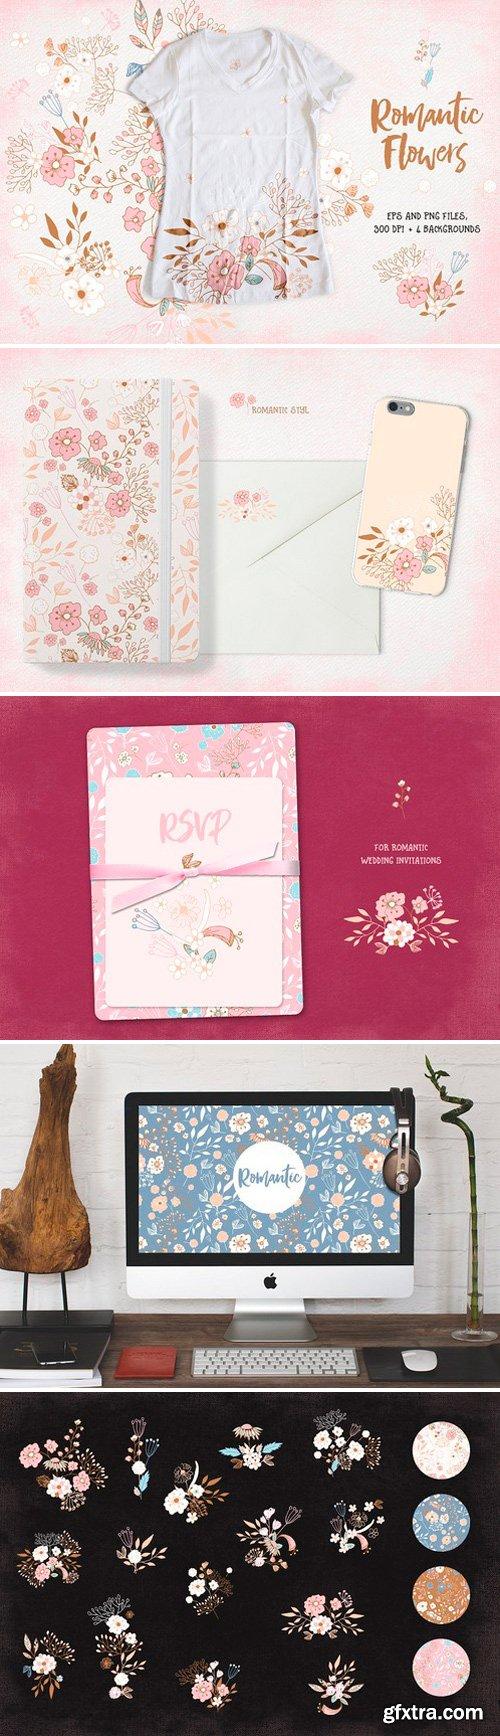 CM - Romantic Flowers 729633